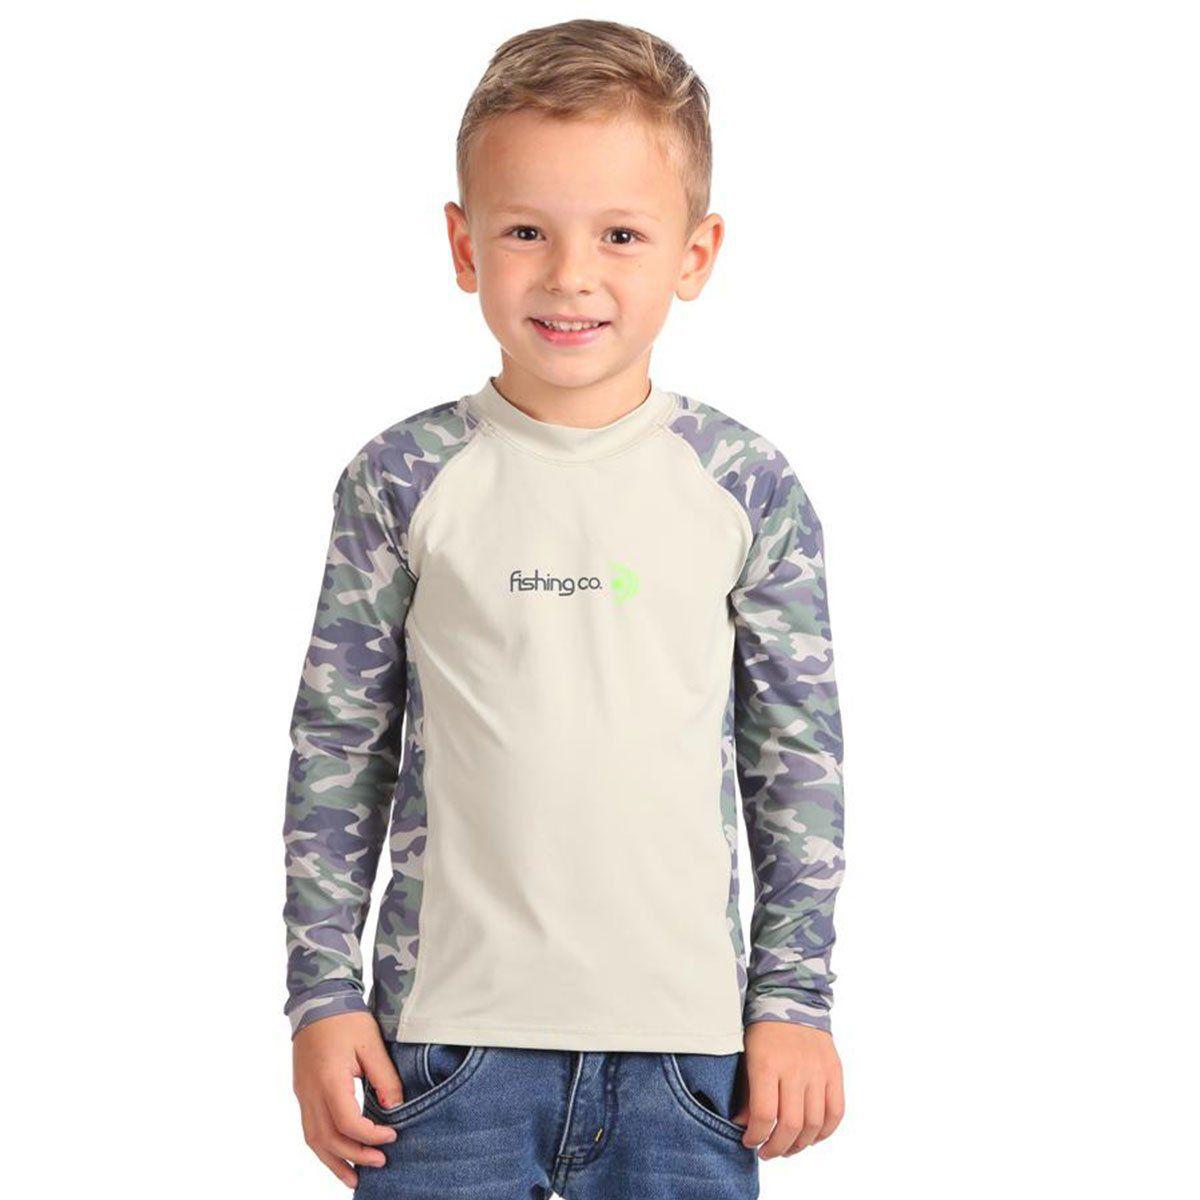 Camiseta Infantil Estampada Atacama/Camuflado